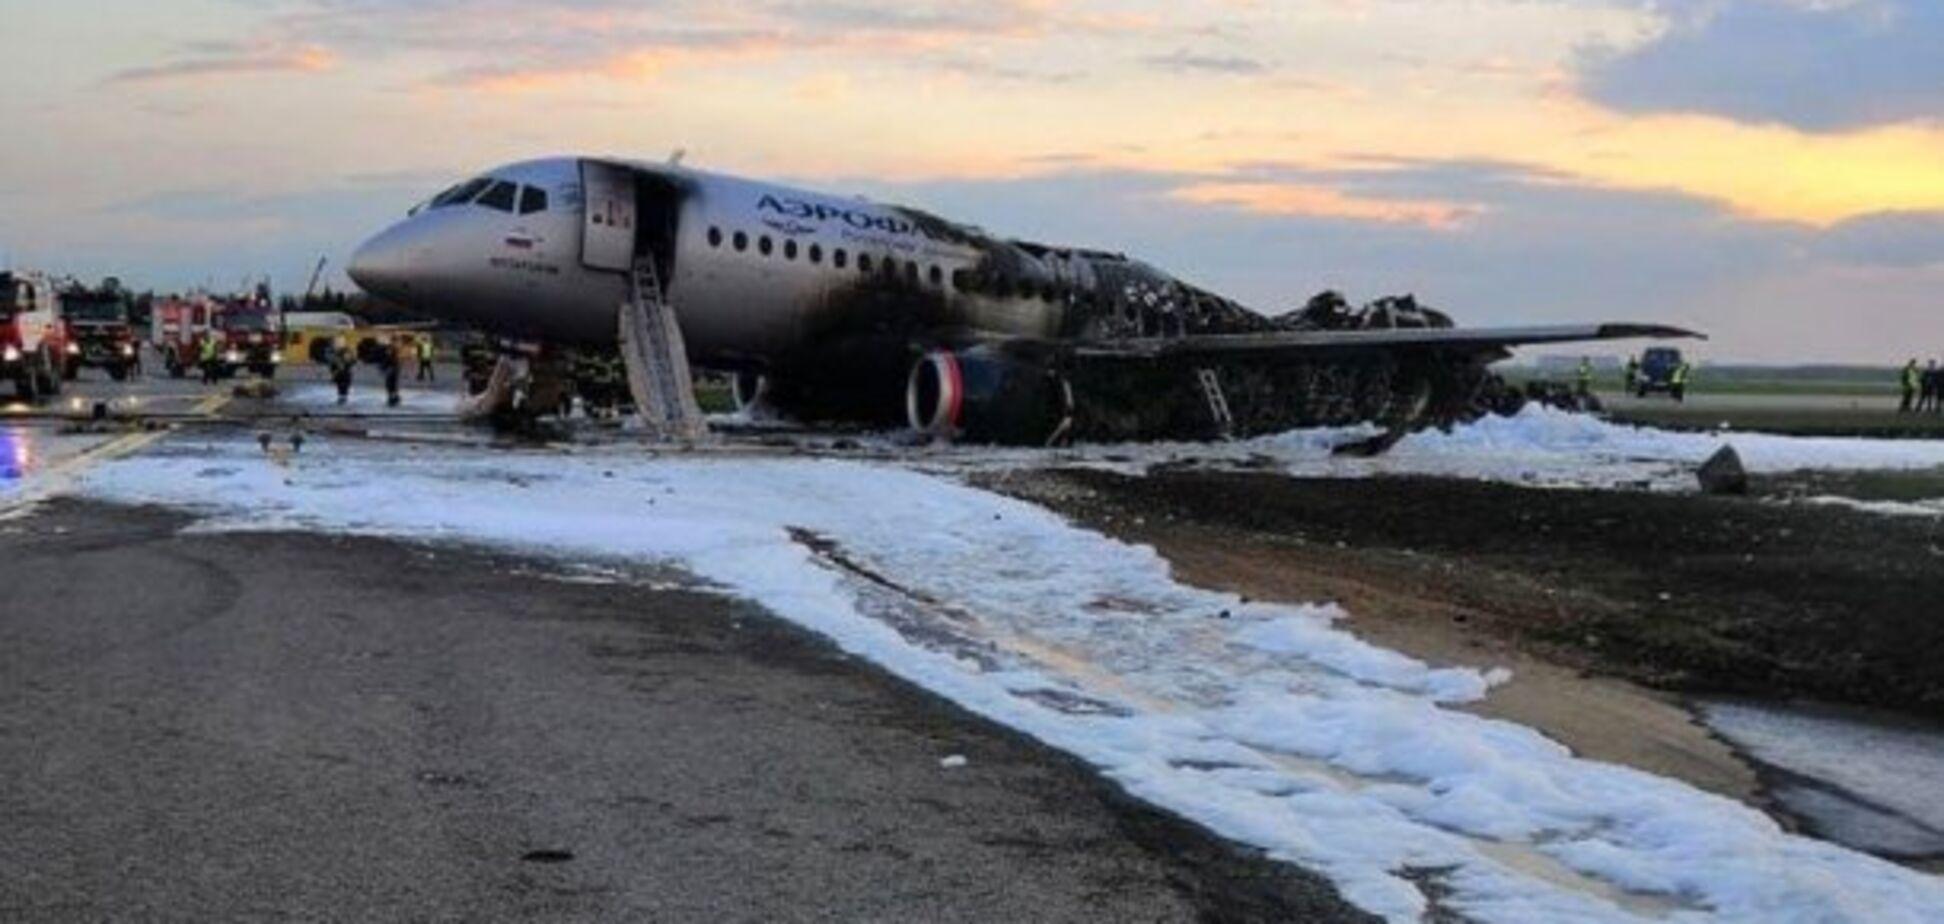 В крушении 'суперджета' виновато руководство 'Аэрофлота'